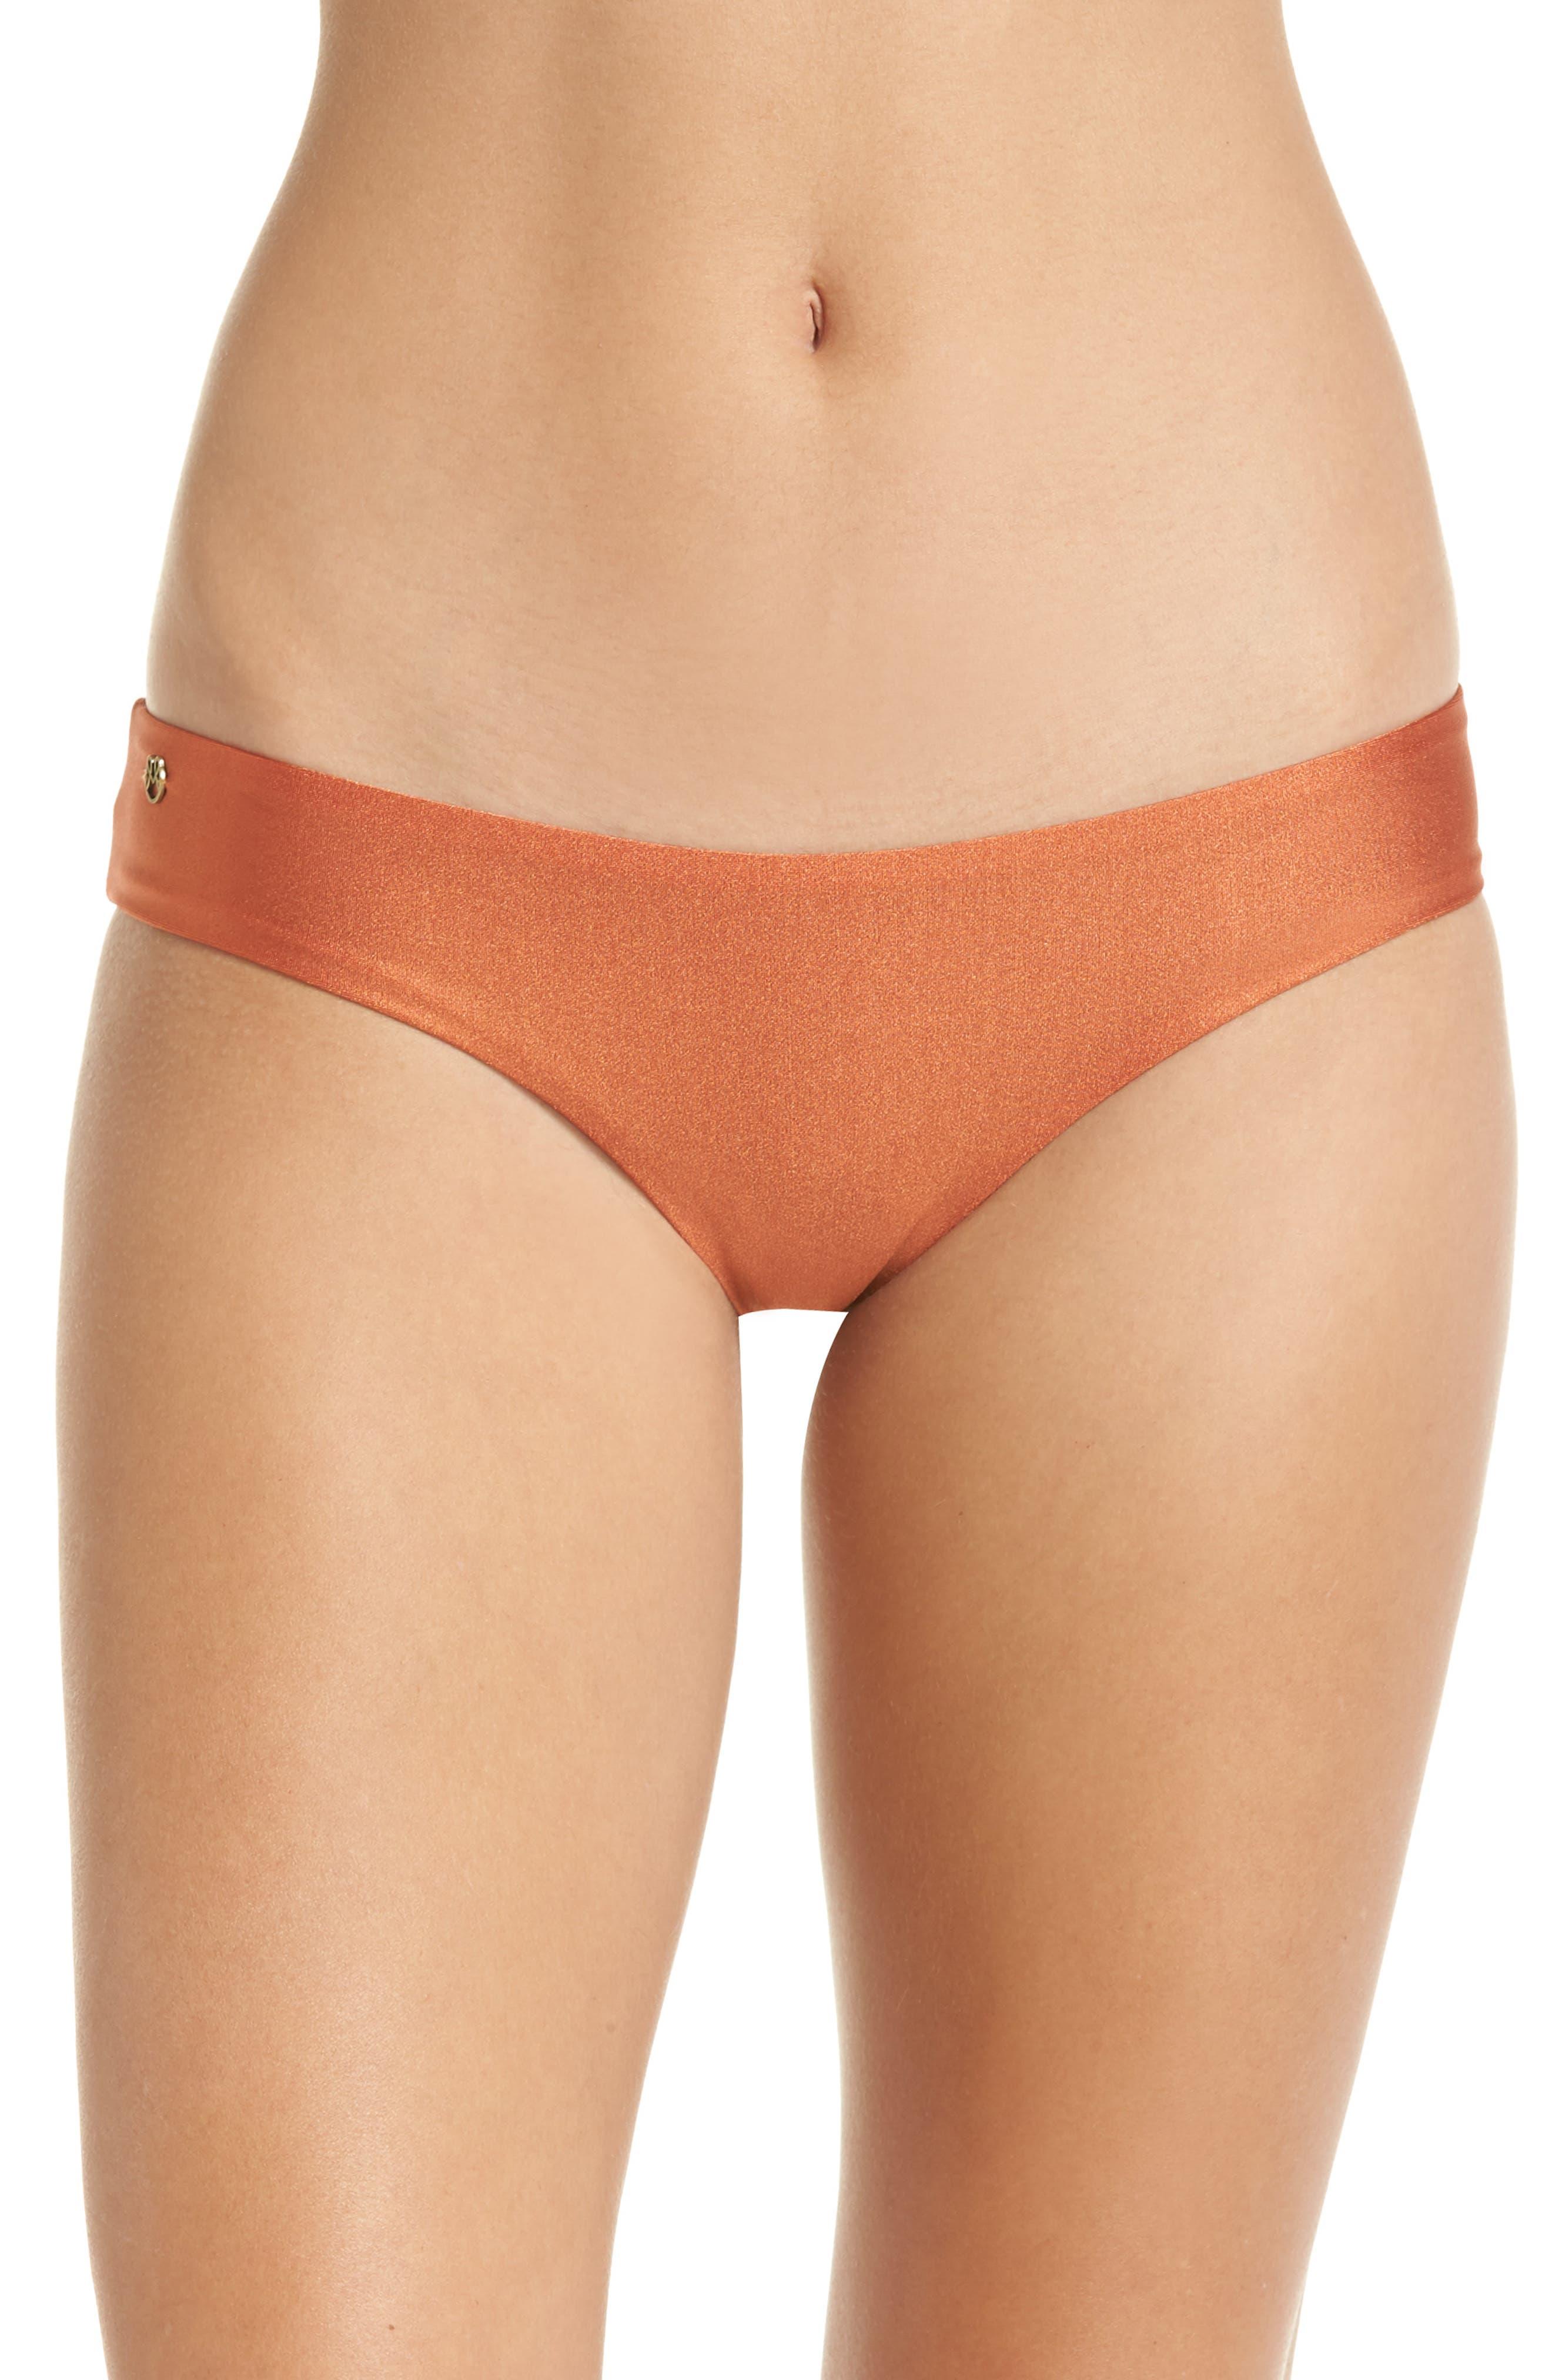 Shimmering Sublime Signature Reversible Bikini Bottoms,                         Main,                         color, 221